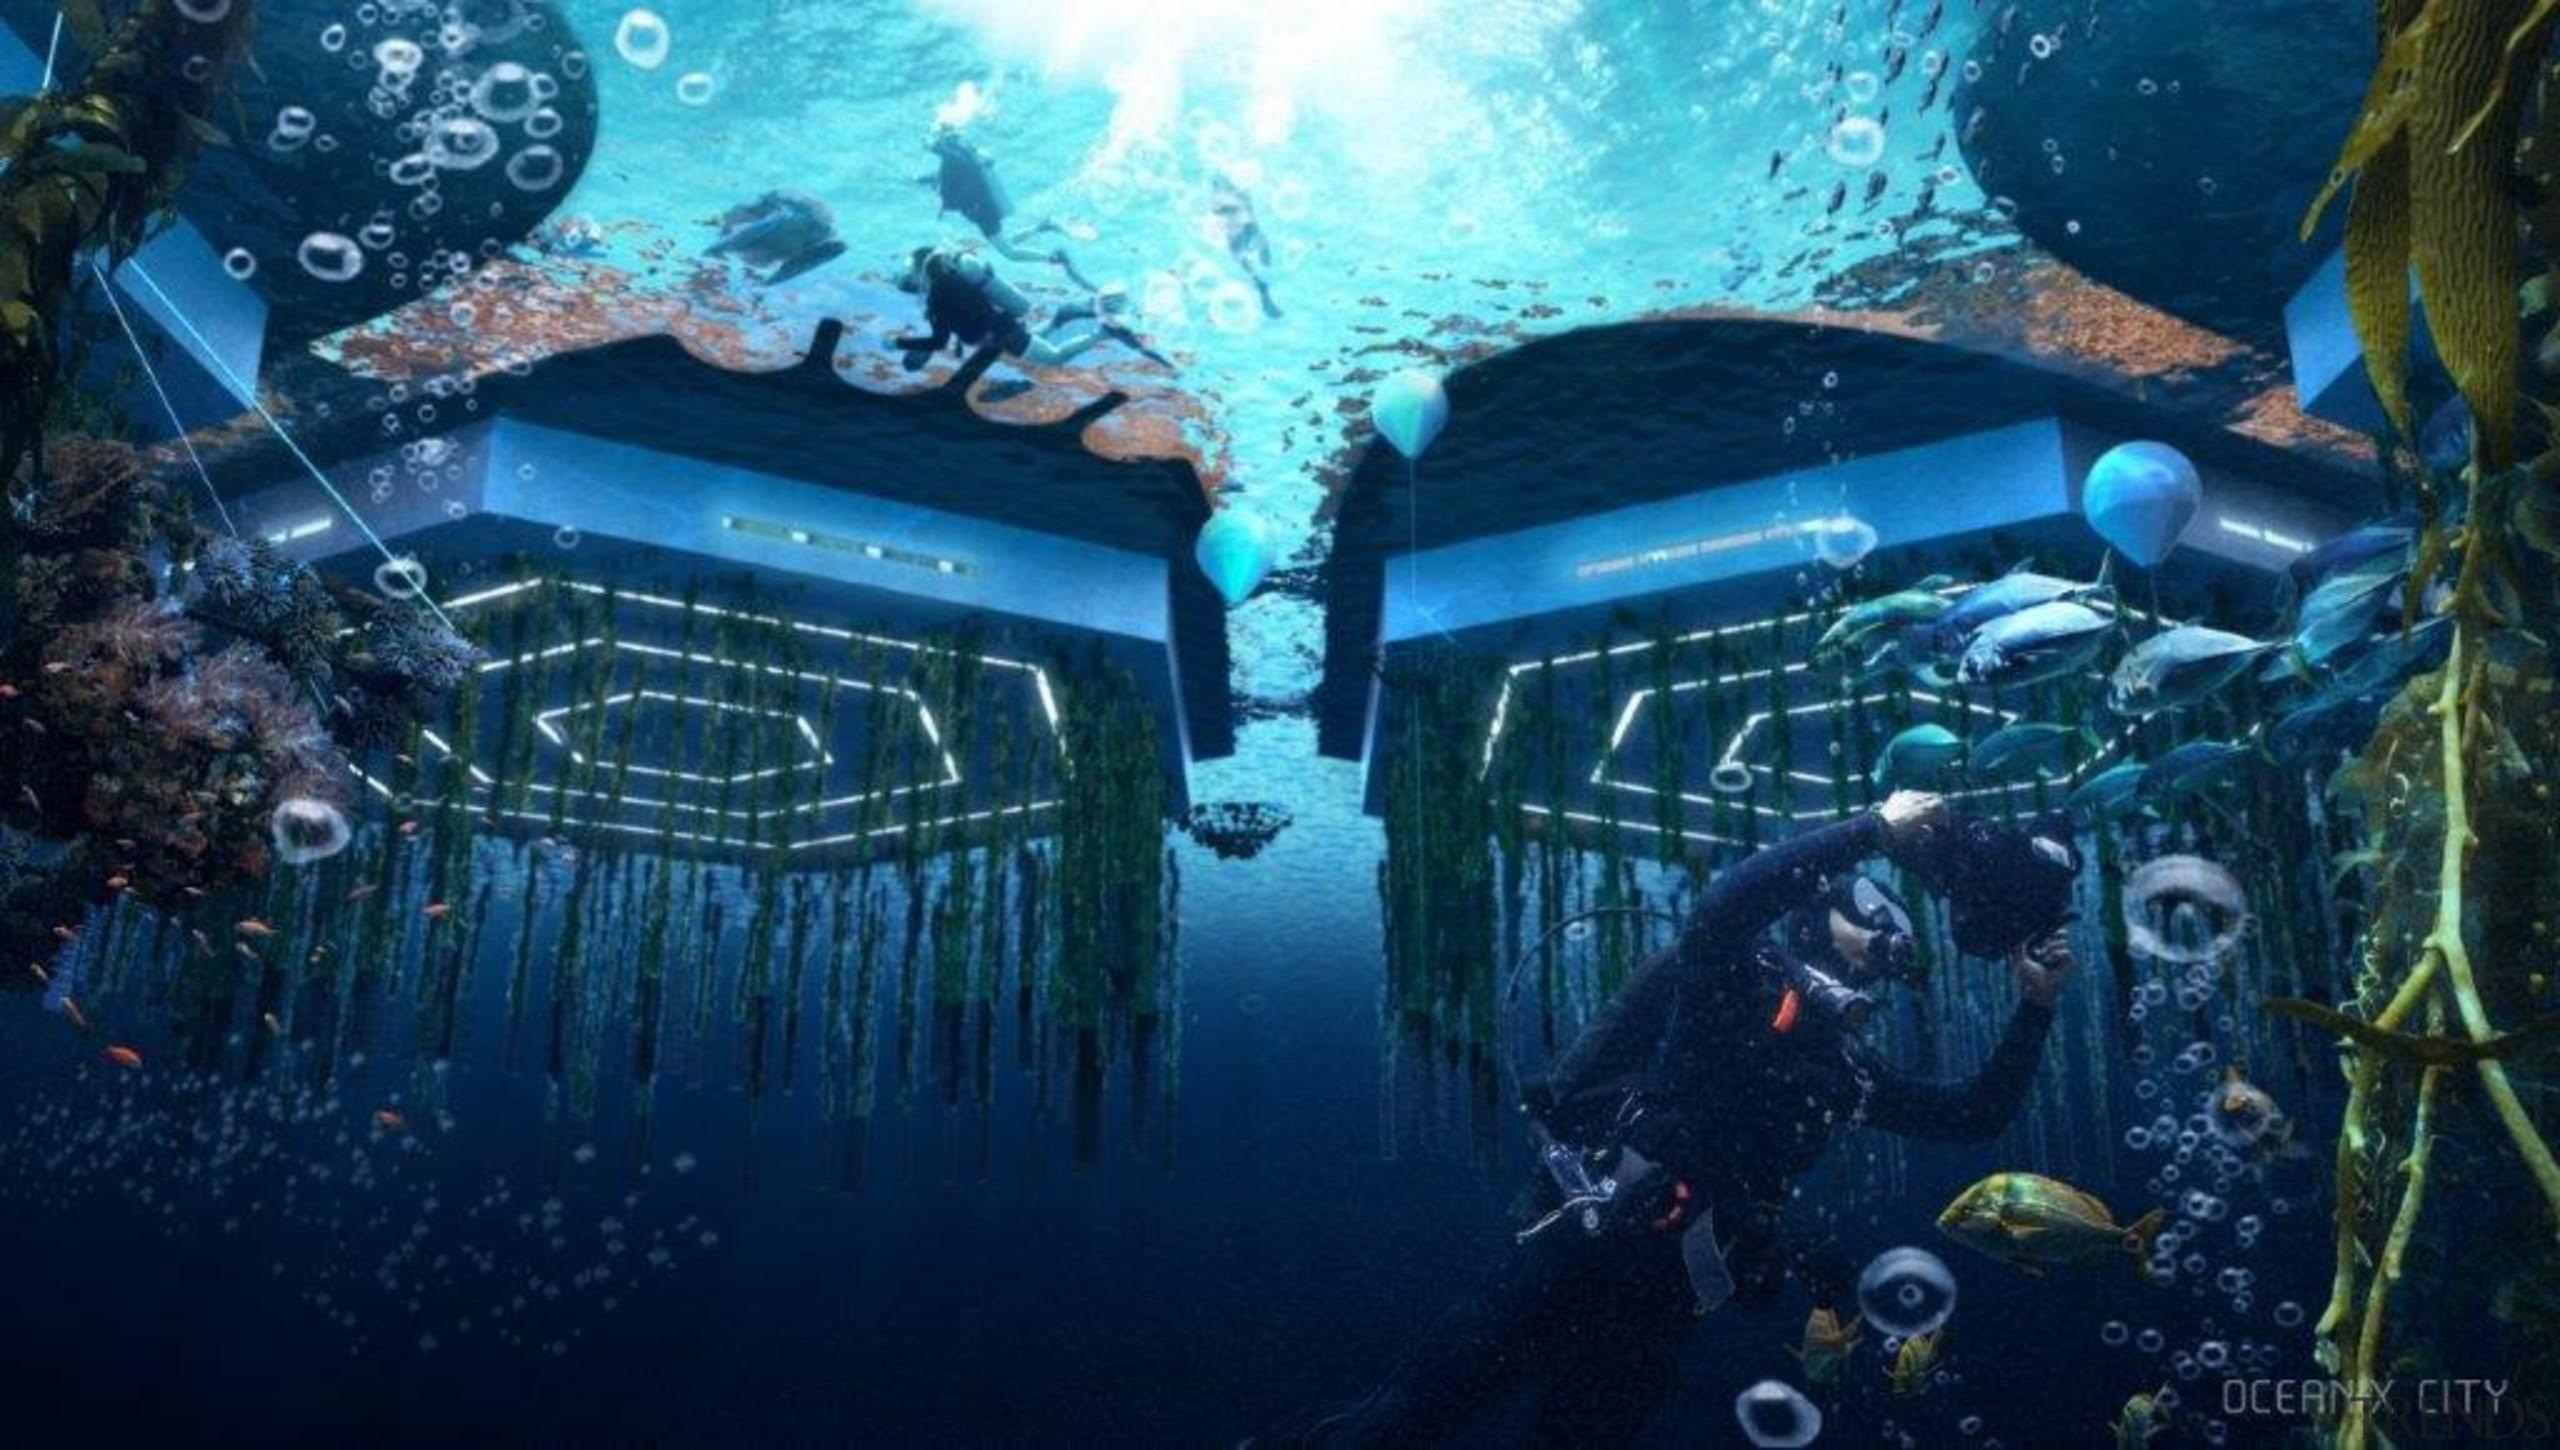 Below sea level, beneath the platforms, biorock floating action-adventure game, cg artwork, digital compositing, illustration, organism, space, underwater, world, blue